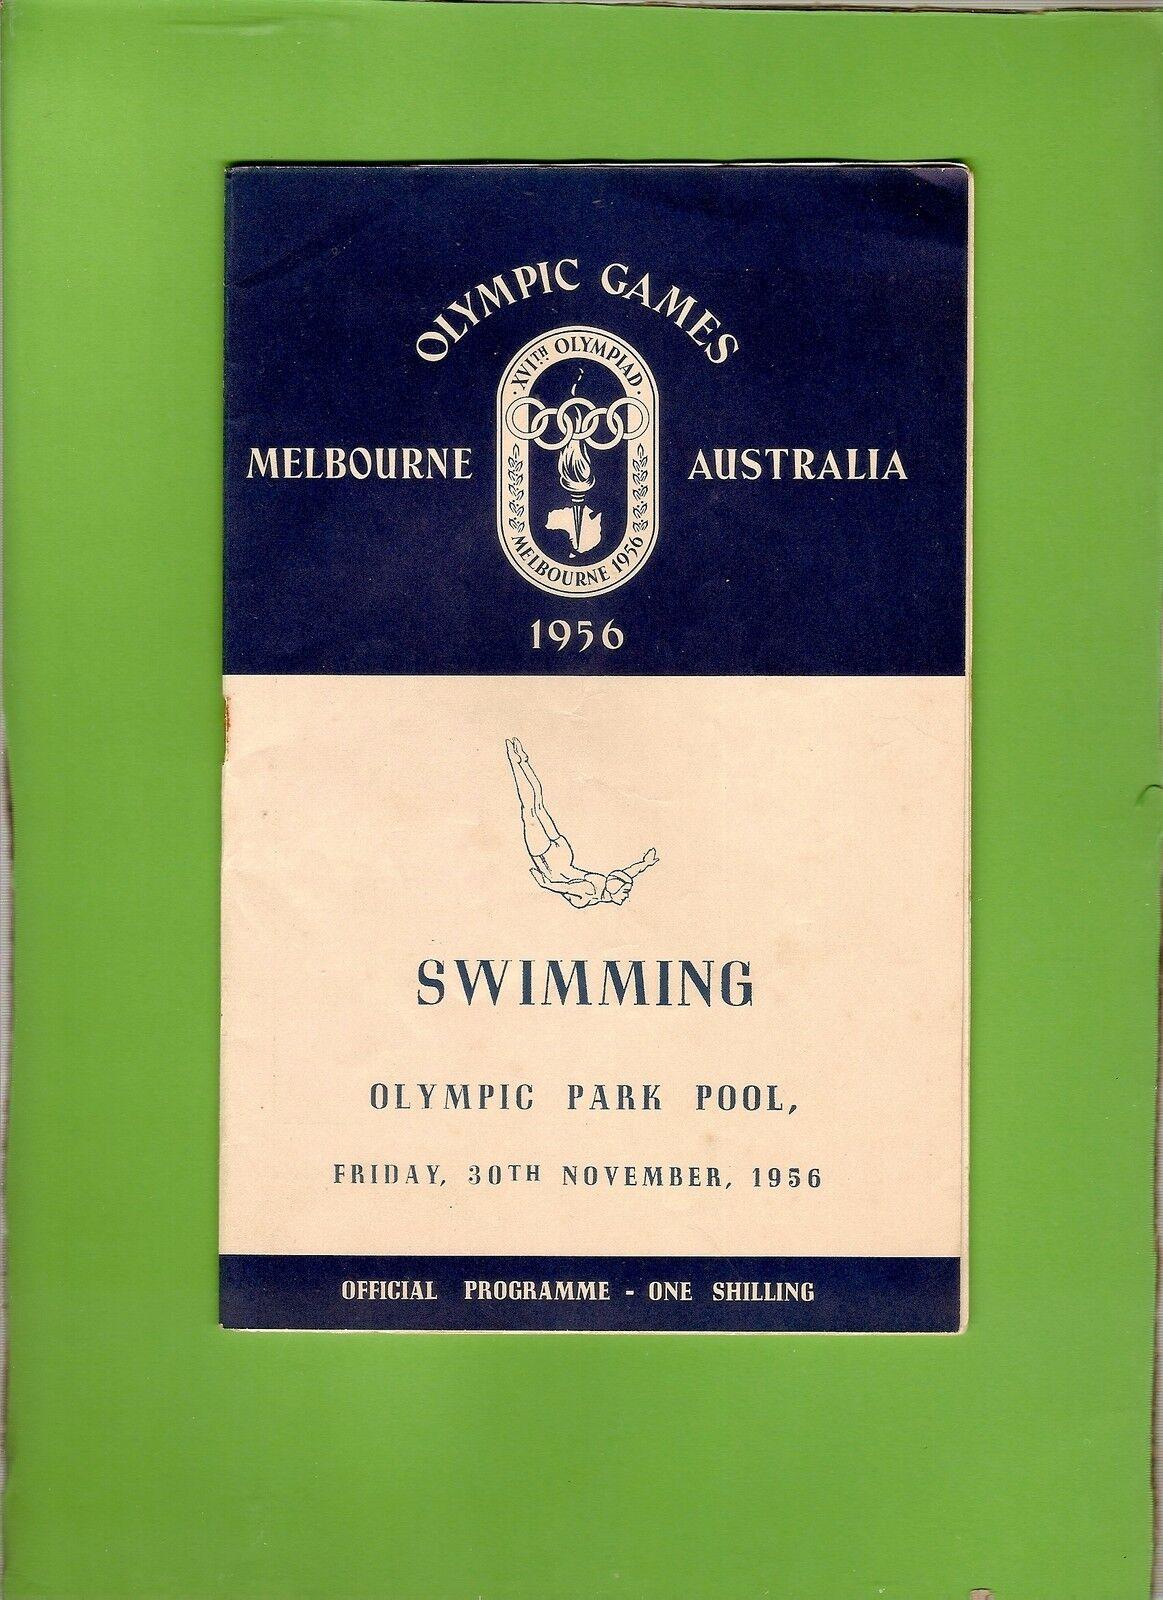 Kombi3.D146.1956 MELBOURNE OLYMPIC GAMES SWIMING PROGRAM, 30th November